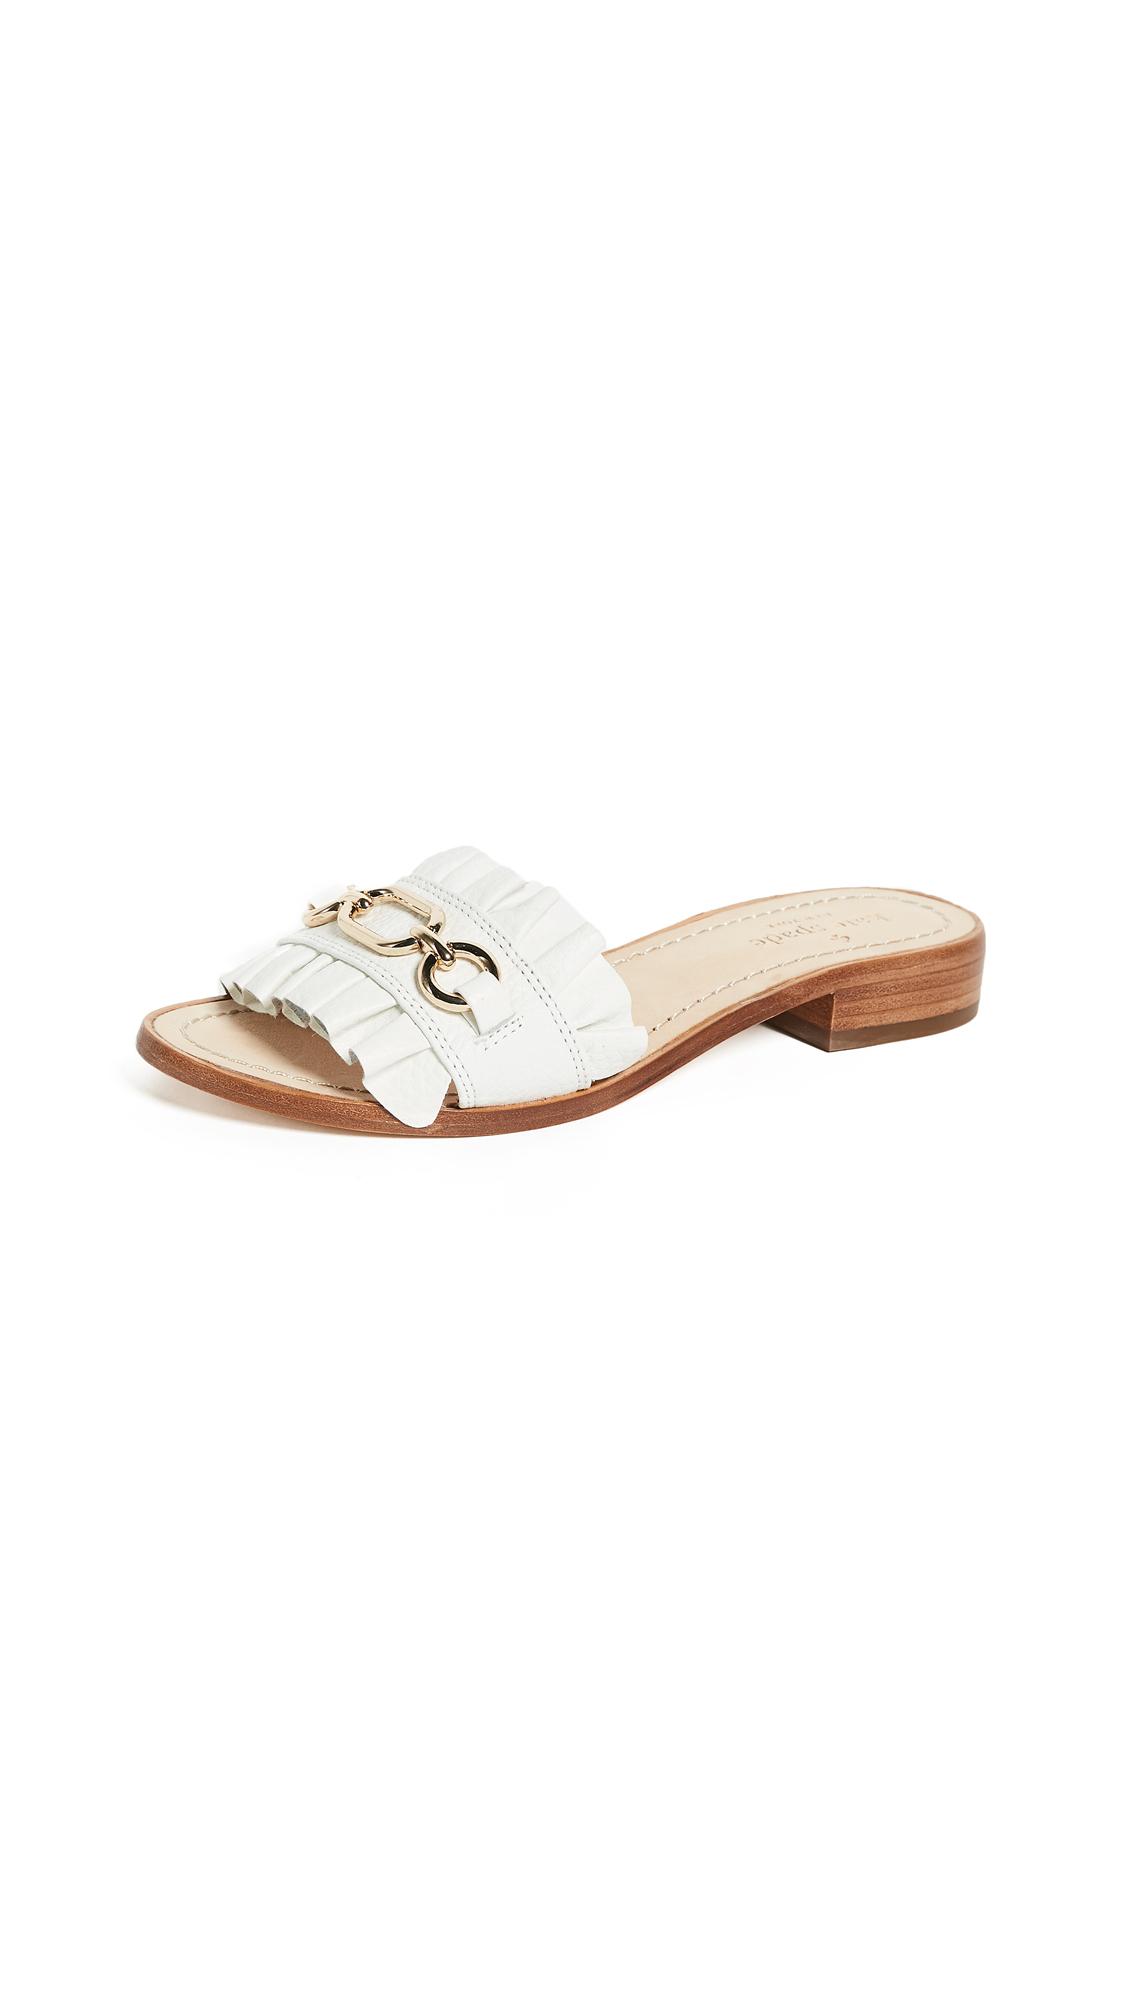 Kate Spade New York Beau Slides - White